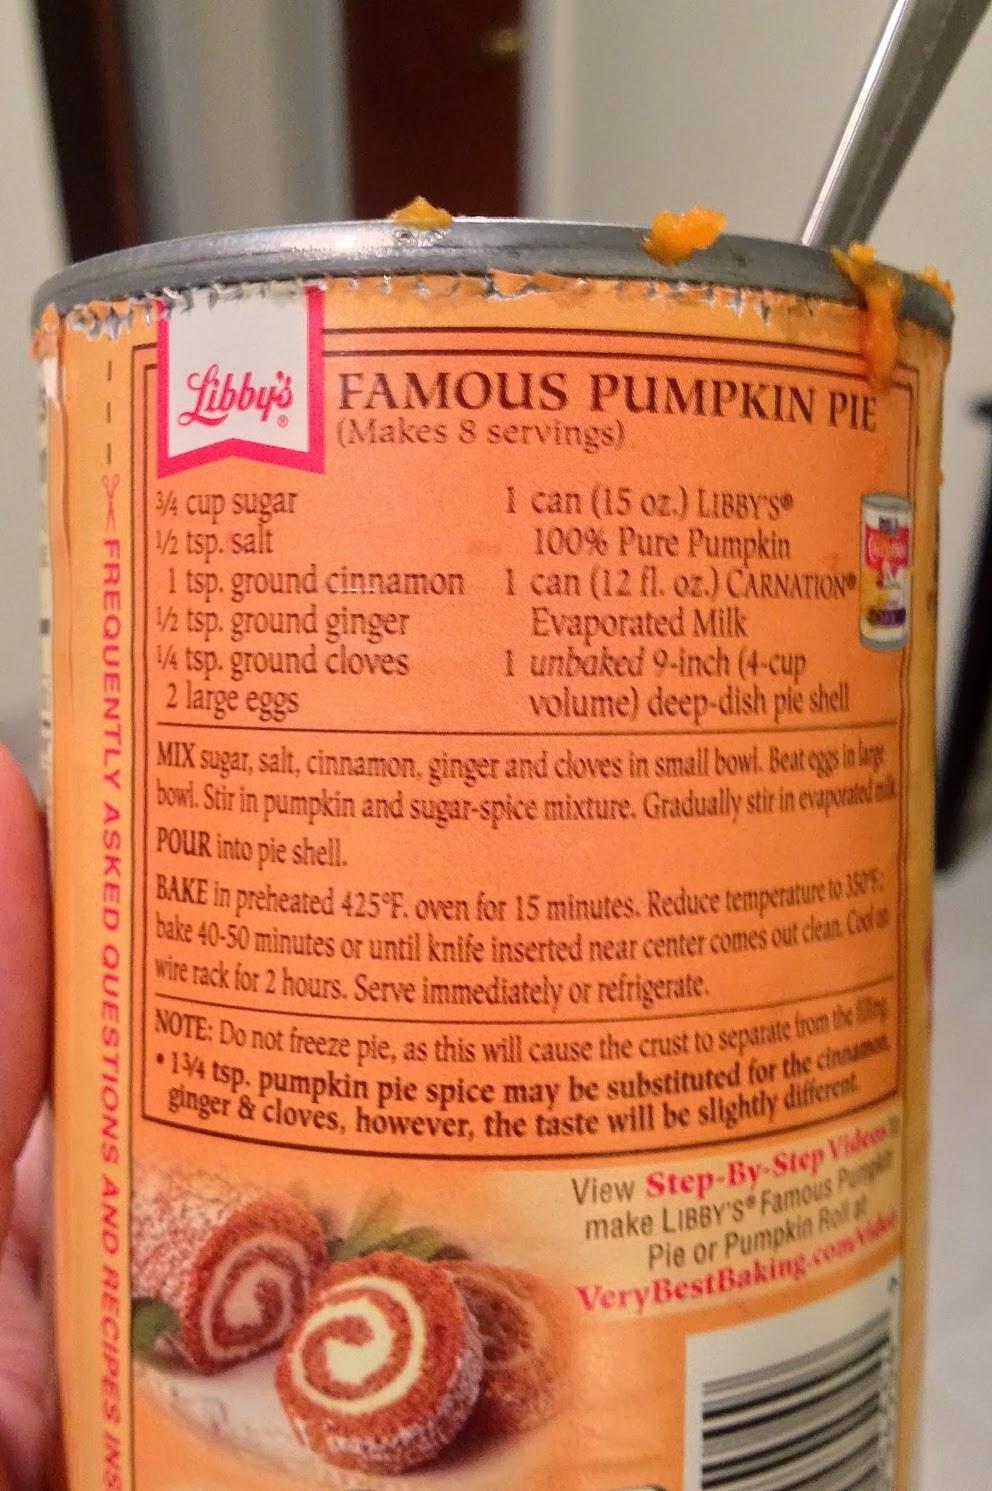 Libbys Pumpkin Pie Recipe  Pumpkin Pie Recipe Husband Special The ULTIMATE Man Made